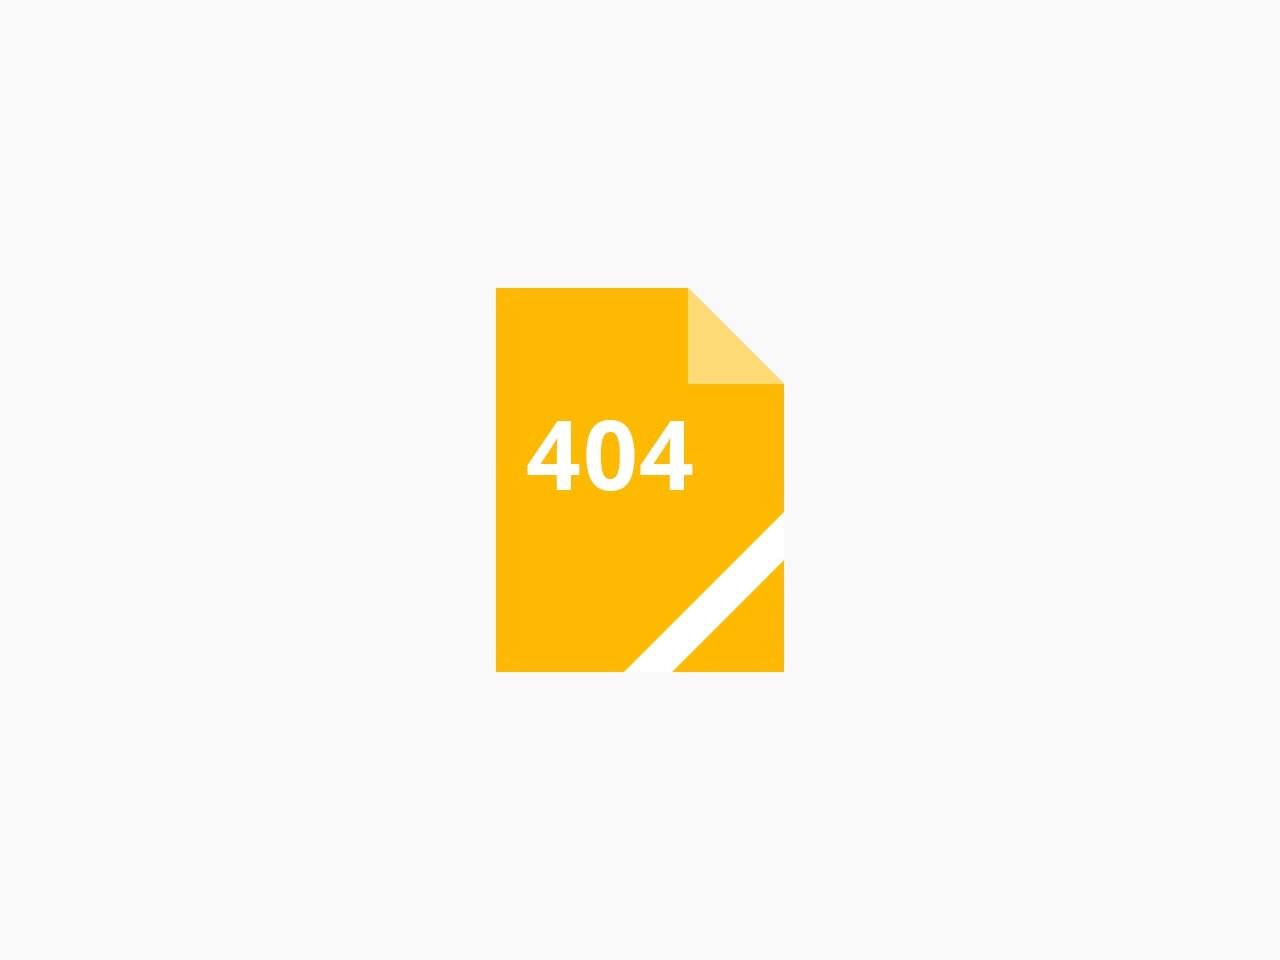 INTERVIEW: The Tech interviews Leonard Nimoy